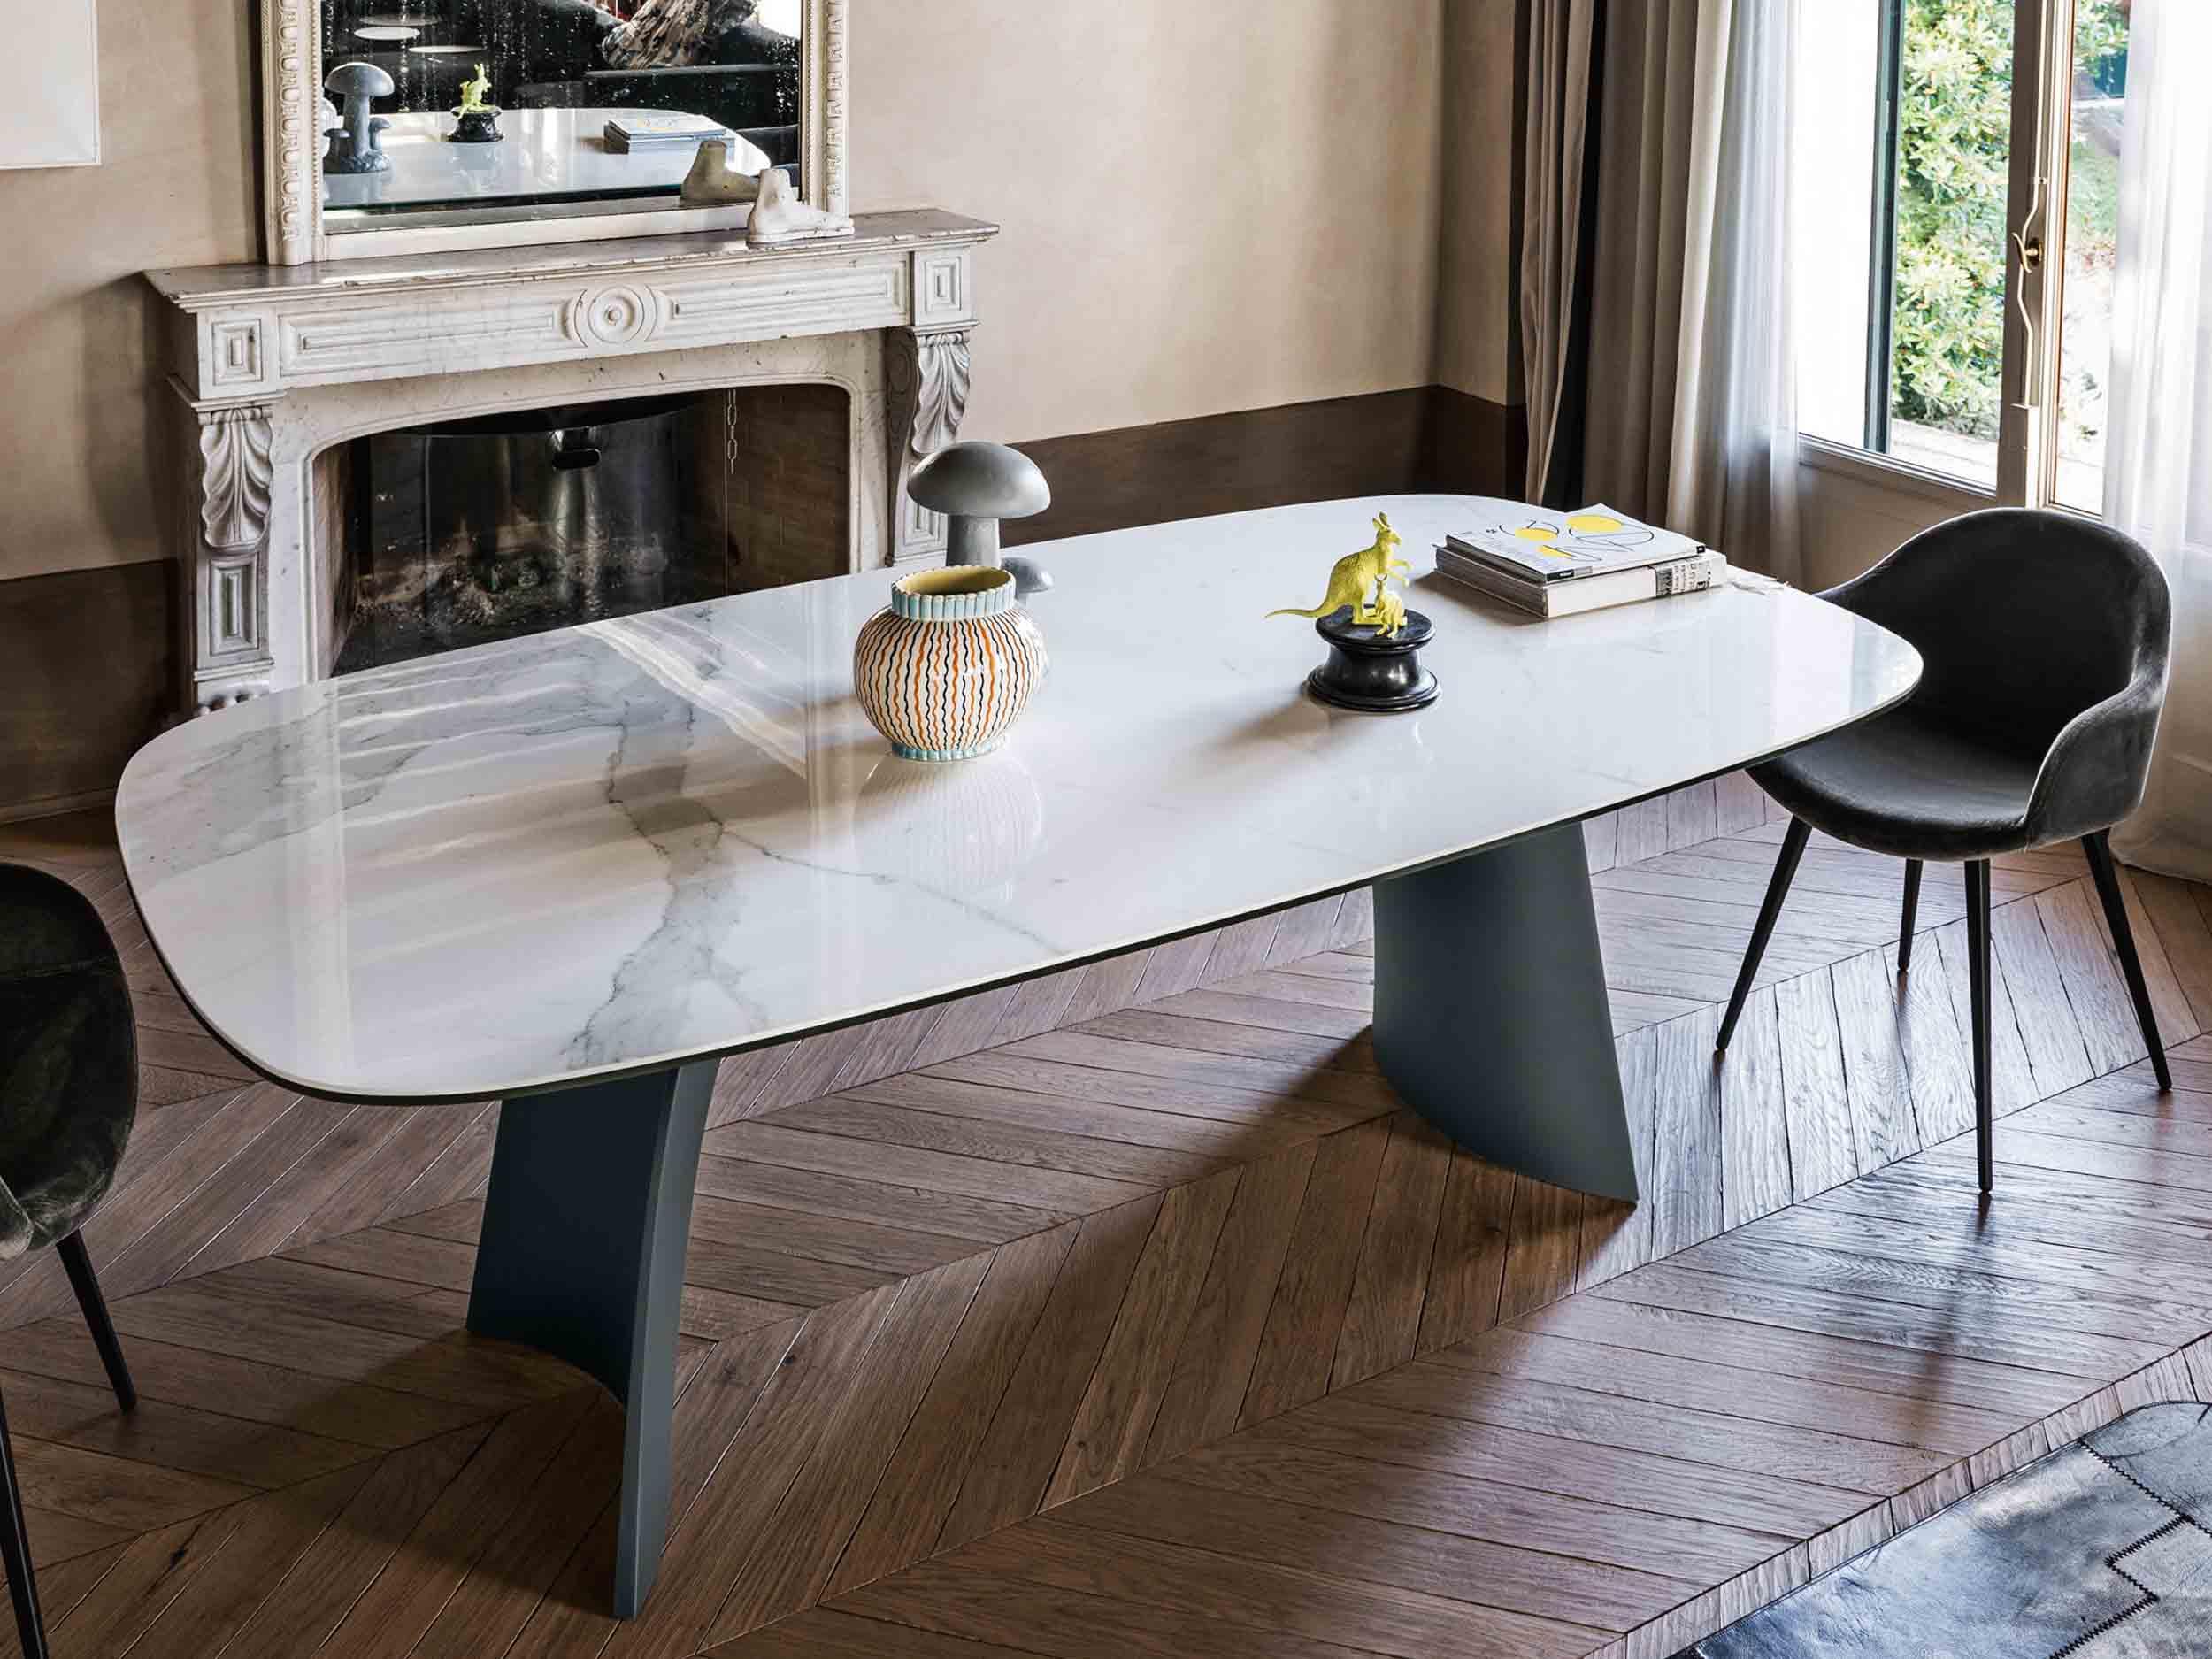 Moonlight Table & Sonny Chair